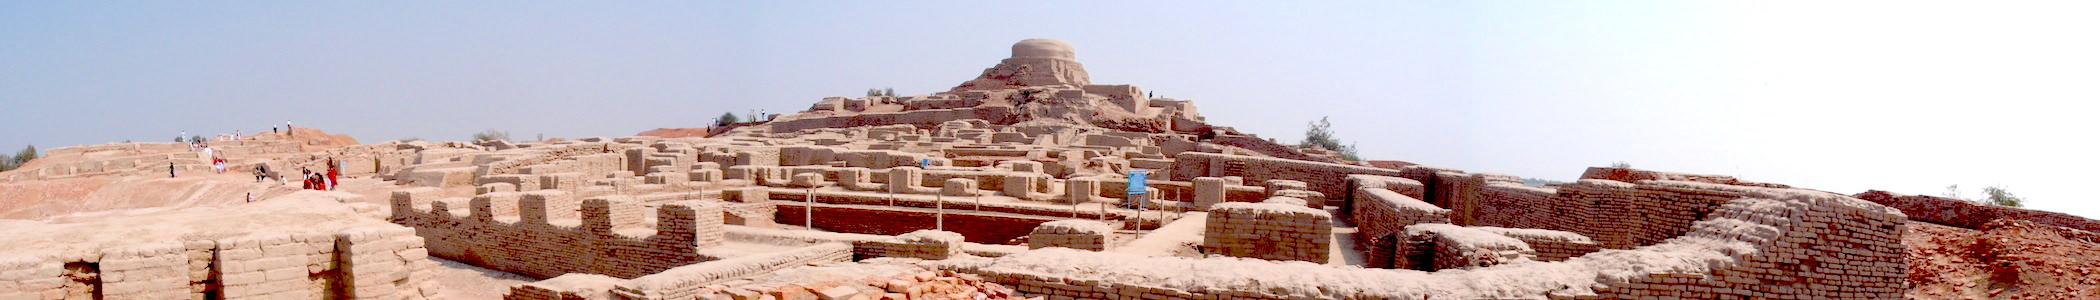 Mohenjo-daro – Travel guide at Wikivoyage